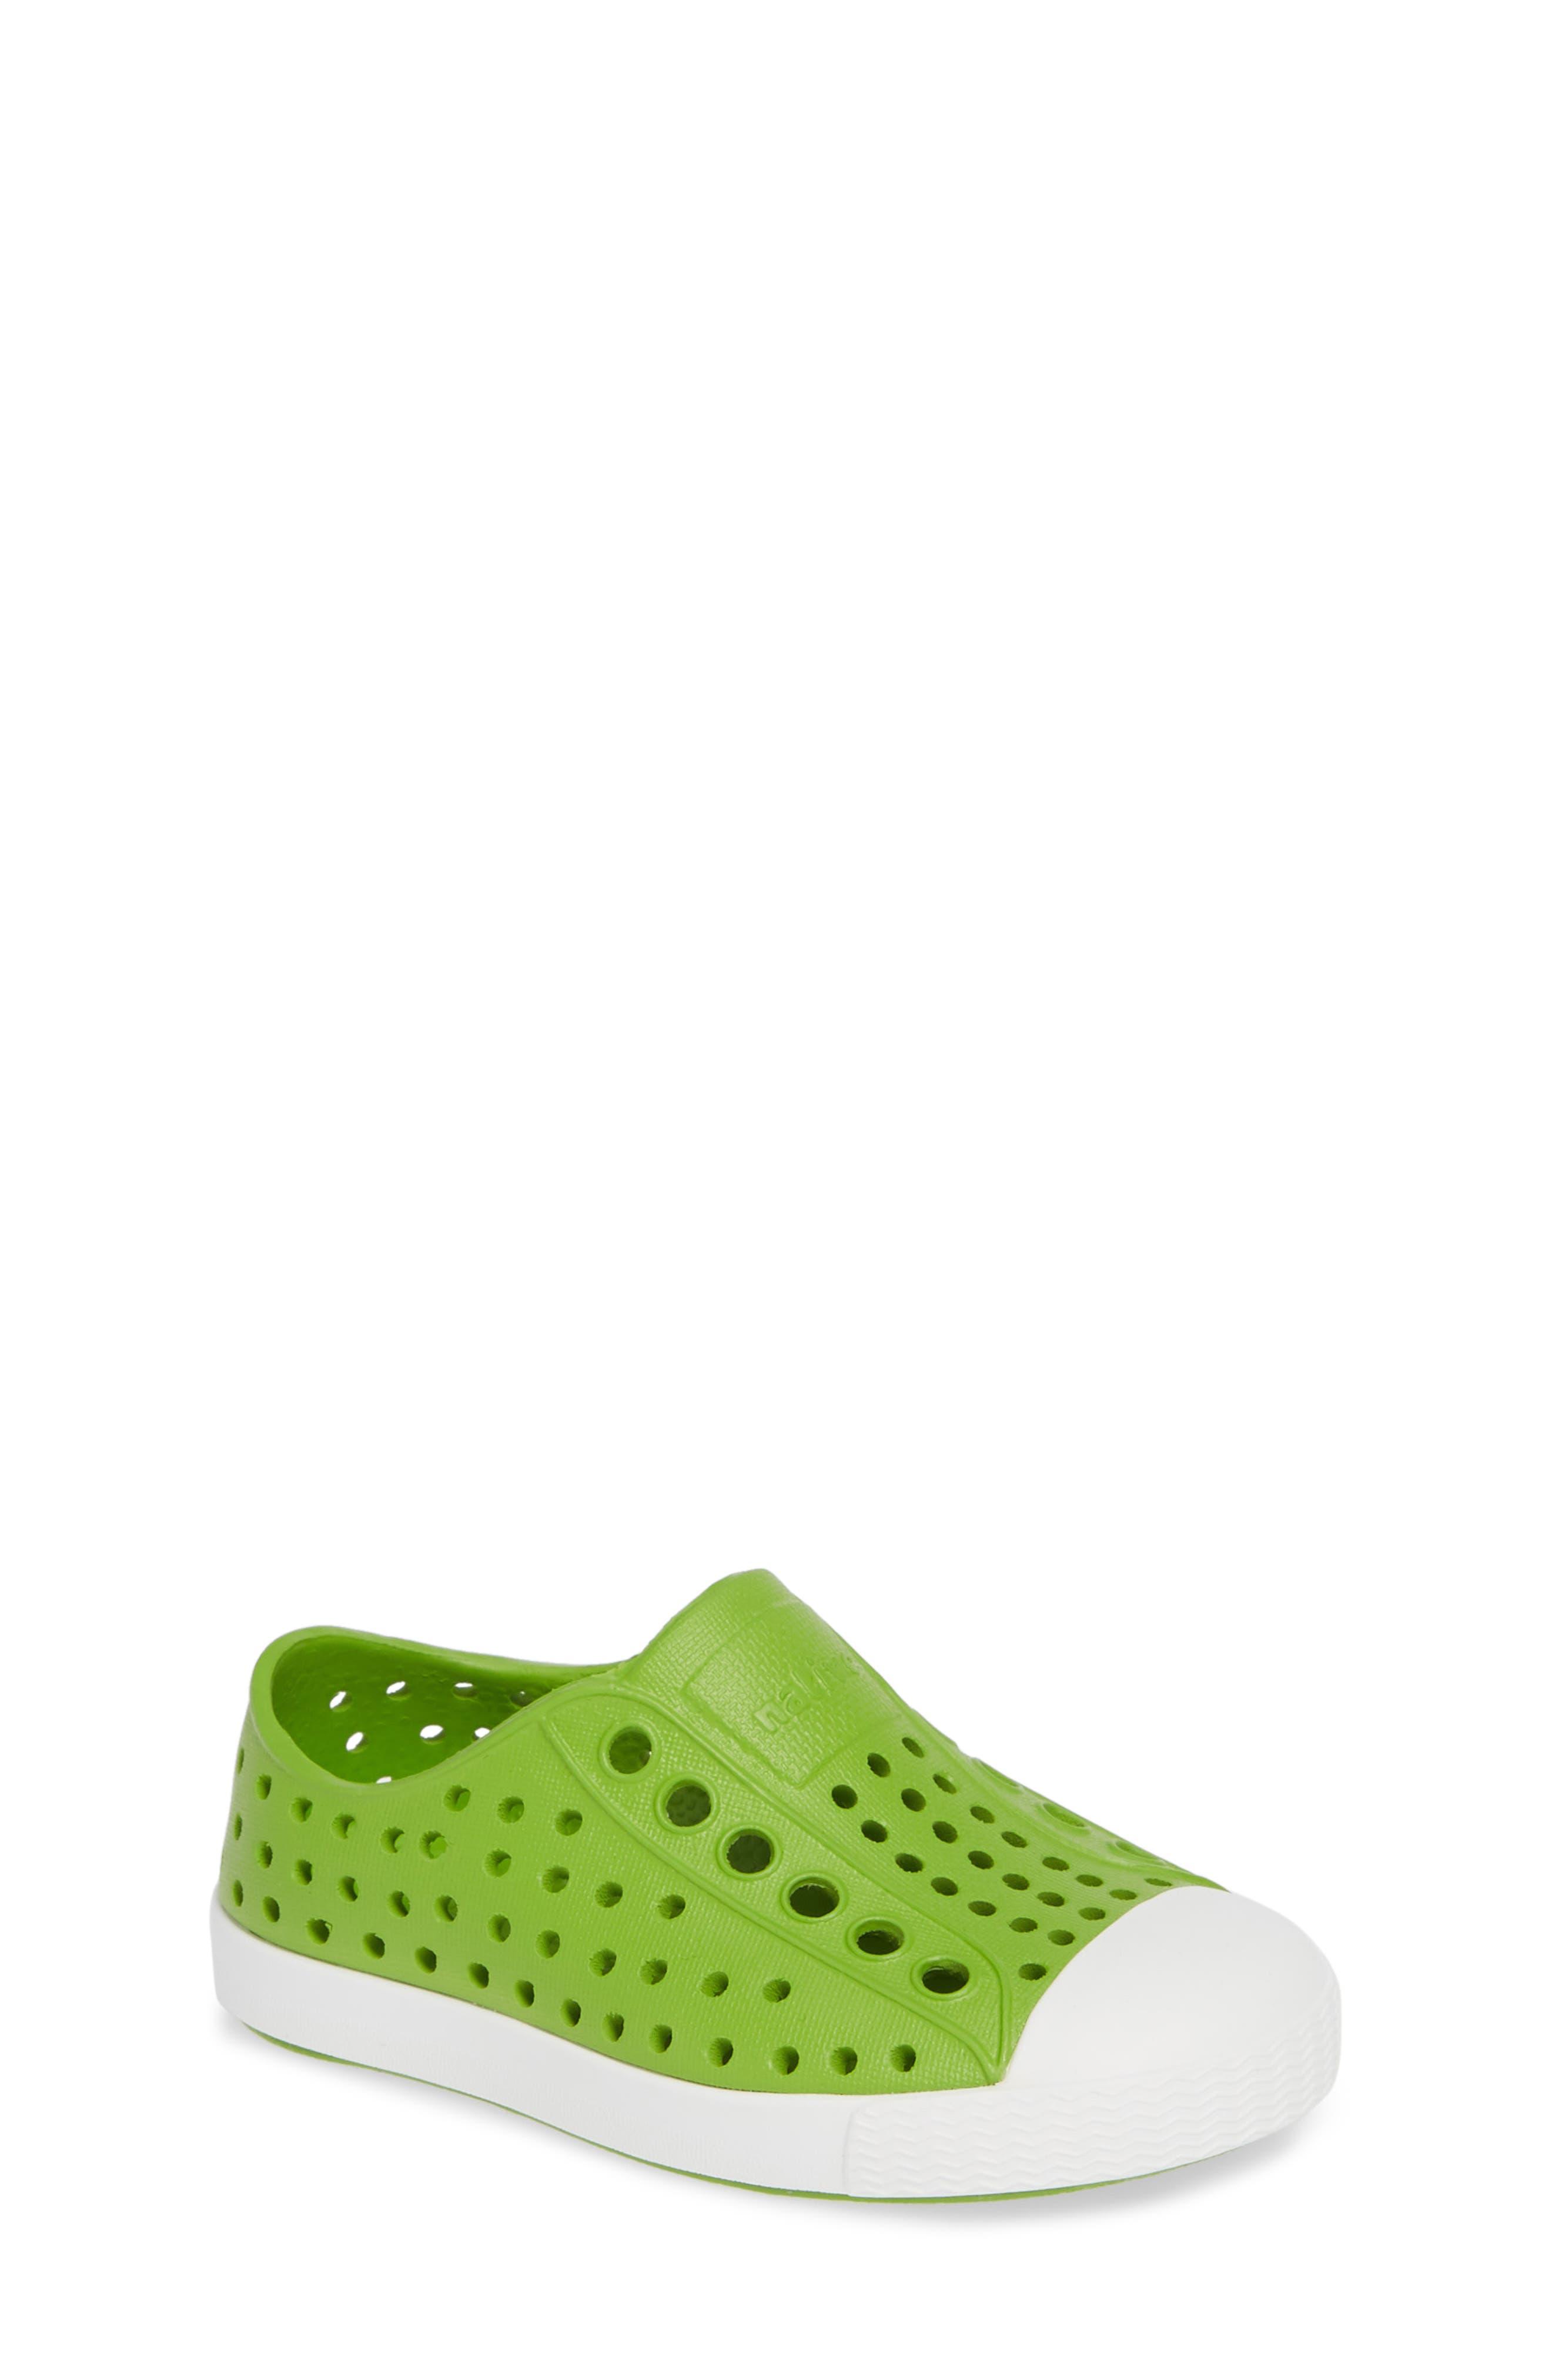 'Jefferson' Water Friendly Slip-On Sneaker,                             Main thumbnail 18, color,